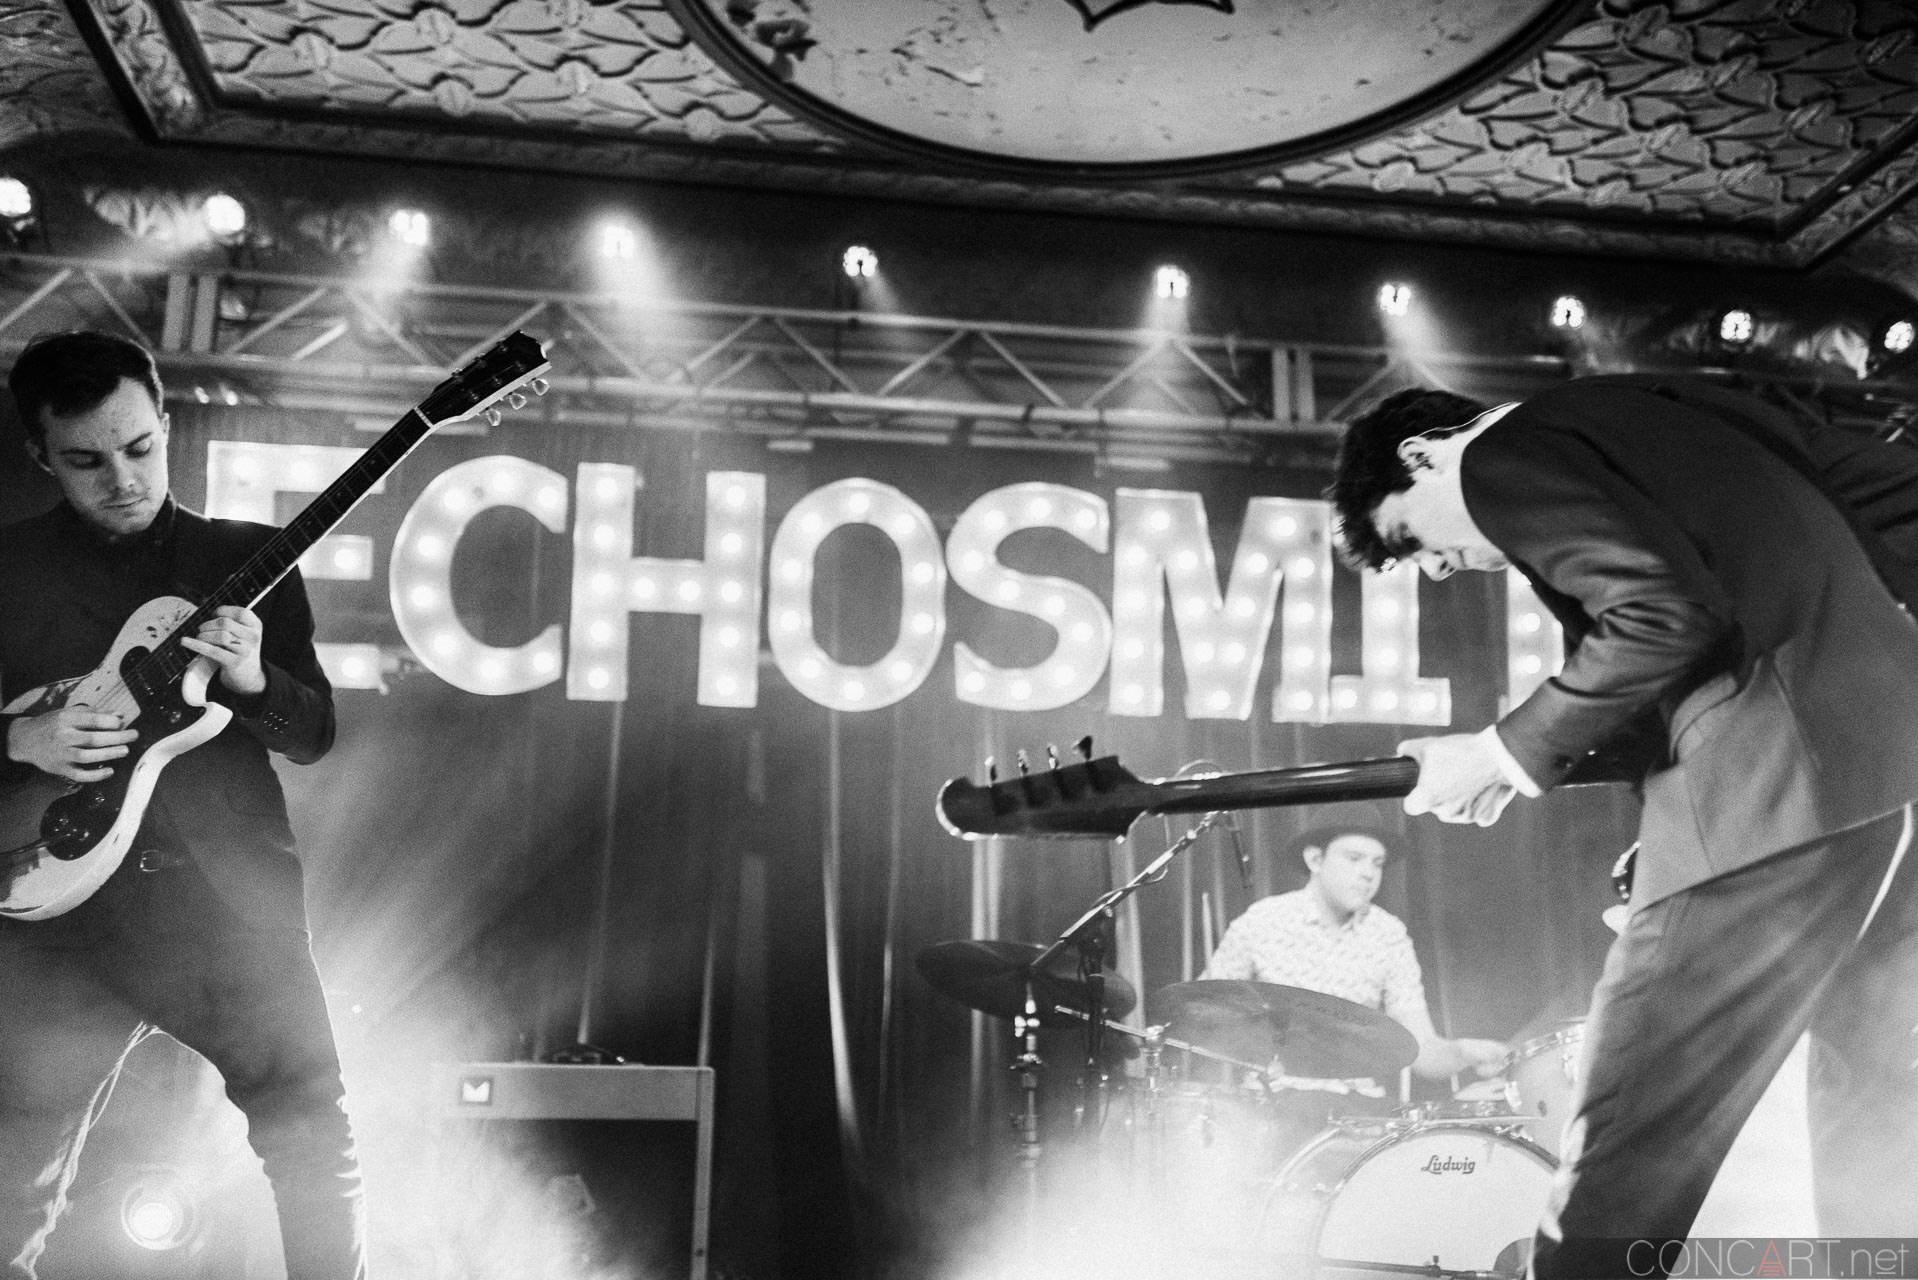 Echosmith photo by Sean Molin 29